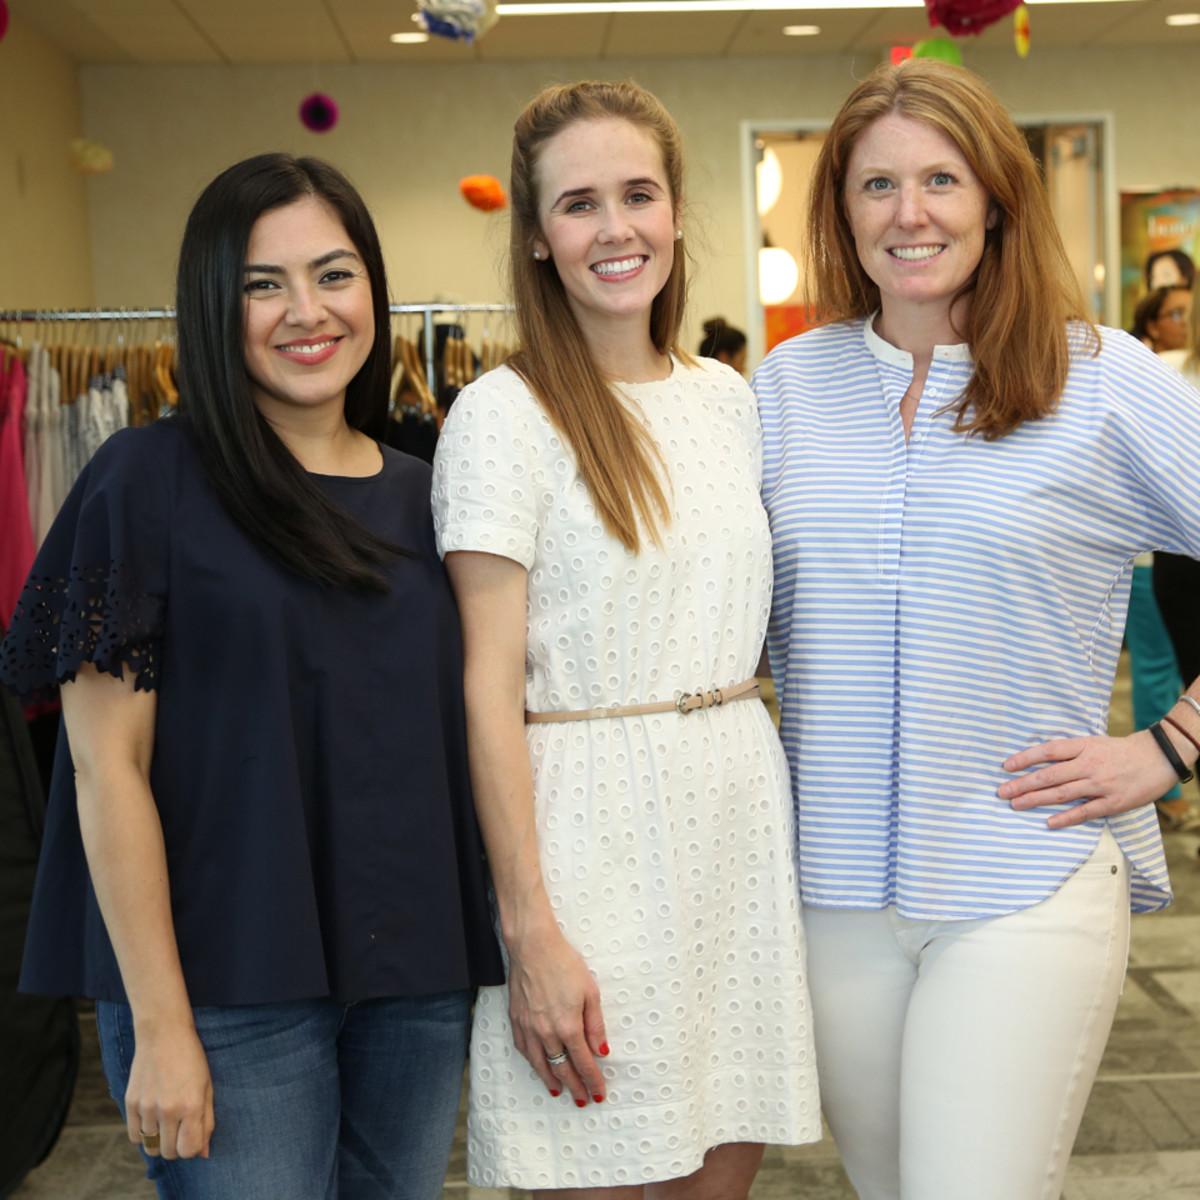 WOW Membership Fiesta 2015 Karla Gutierez, Hanna Lonergan, Susan Oehl